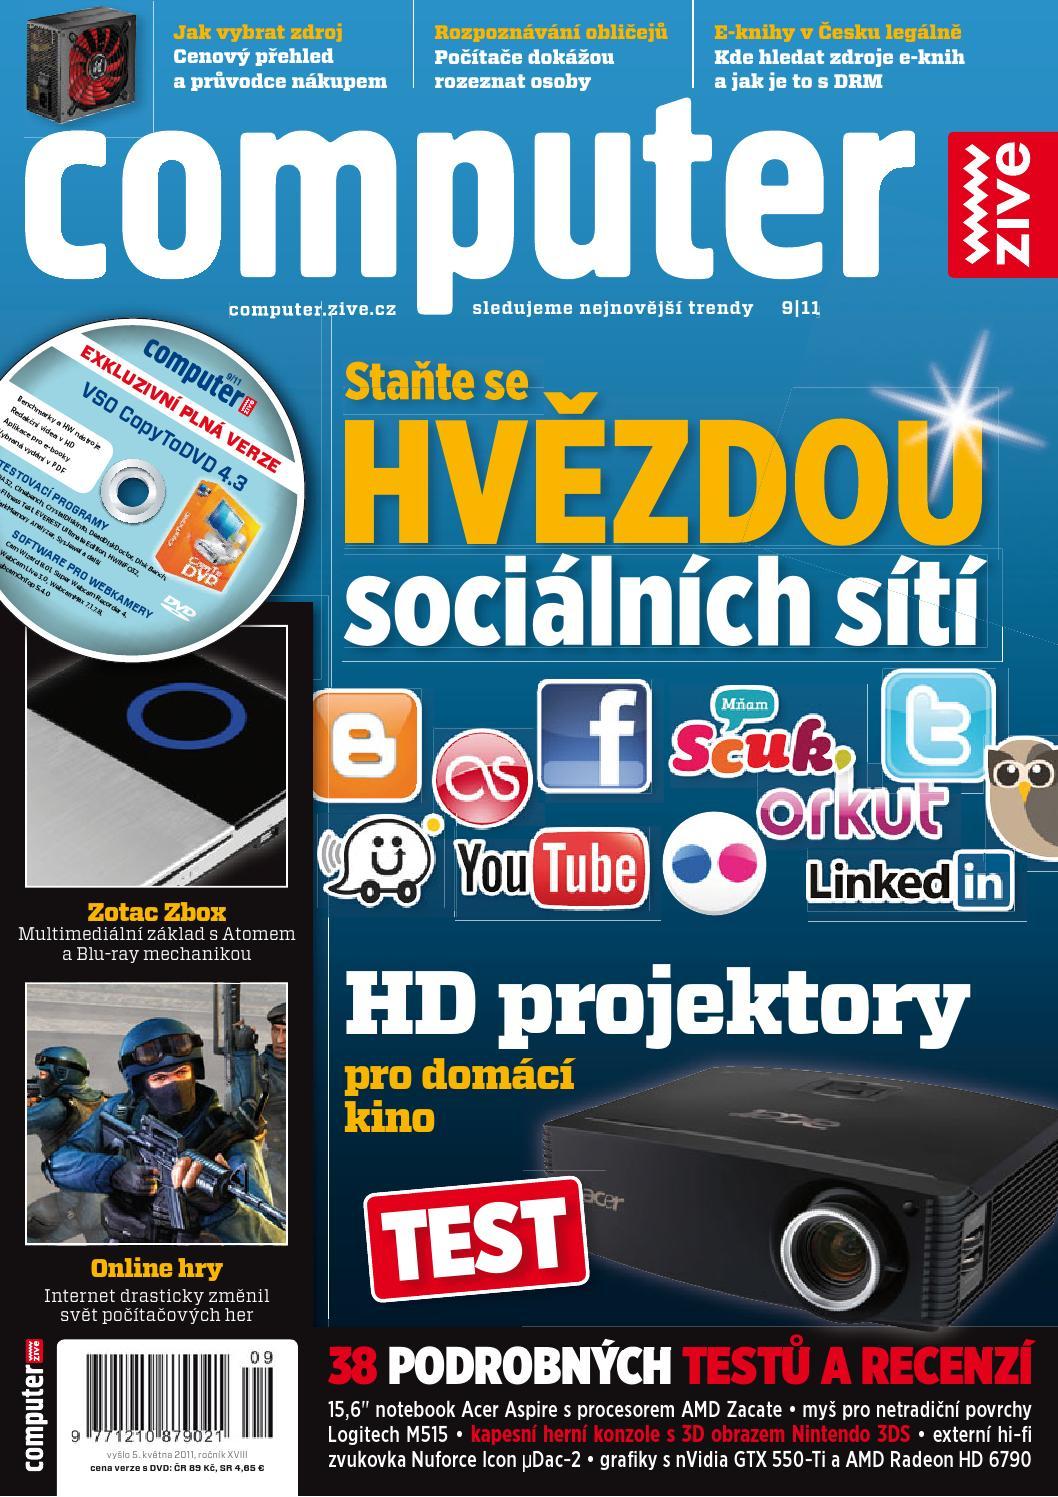 computer by Branwen - issuu ea0277fc00